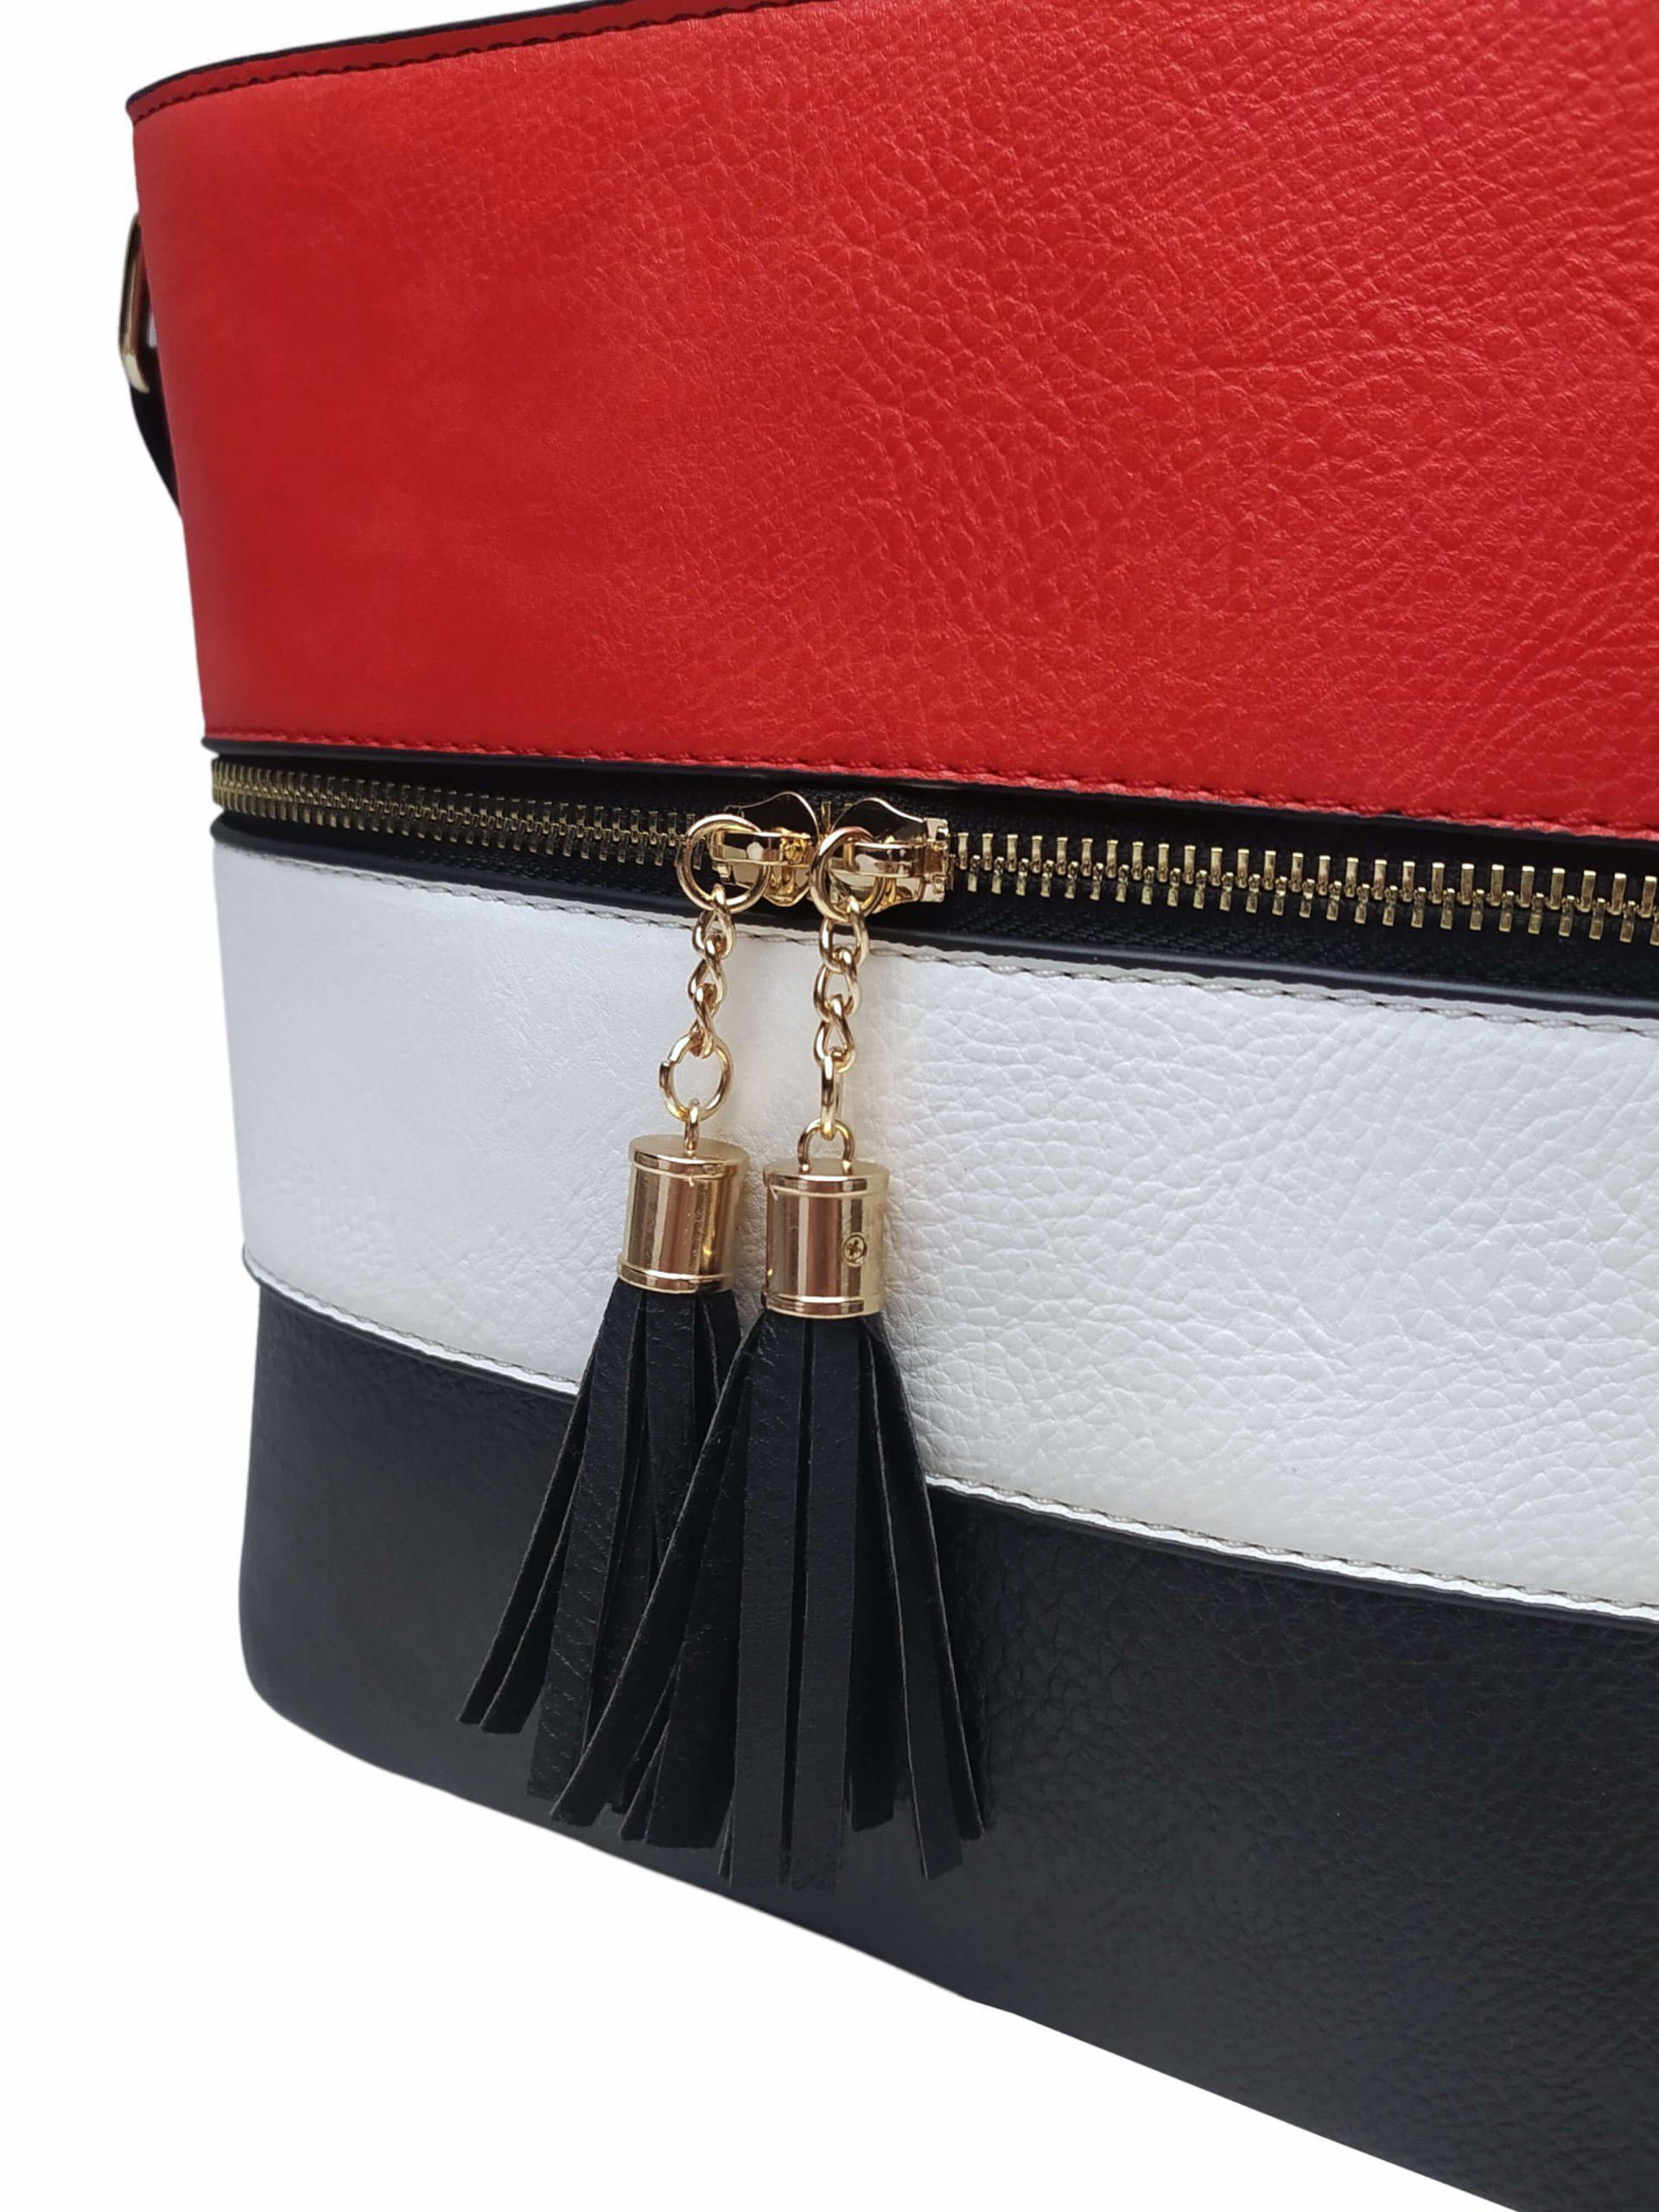 Černo-bílo-červená crossbody kabelka s třásněmi, Sara Moda, 8157, detail crossbody kabelky